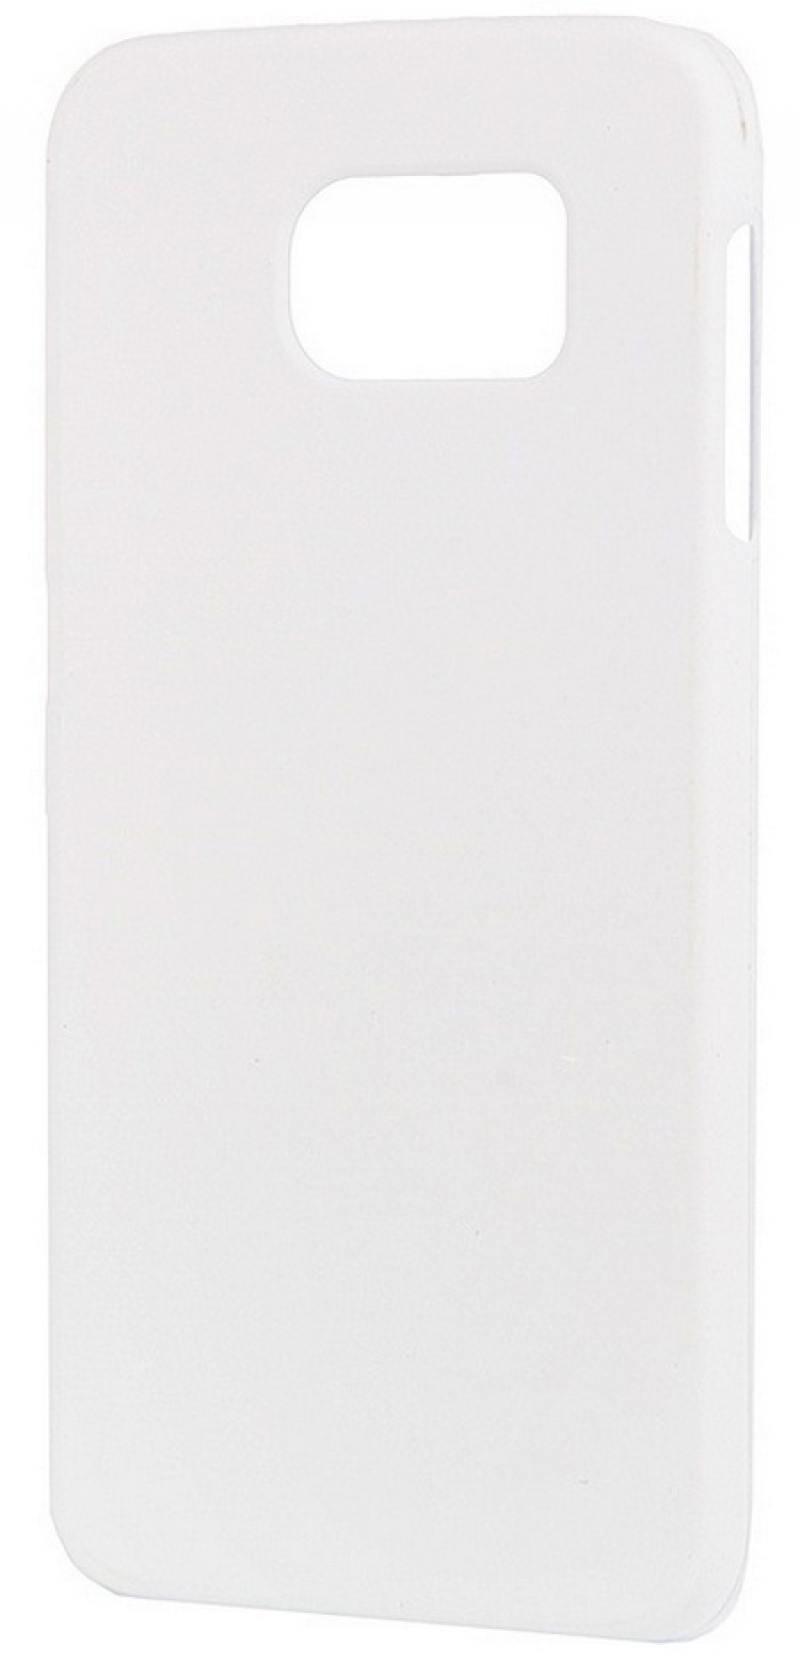 Чехол-накладка для Samsung Galaxy S6 SM-G920F Pulsar CLIPCASE PC РСС0017 White клип-кейс, пластик чехол накладка pulsar clipcase pc soft touch для samsung galaxy e5 sm e500f ds черная рсс0014